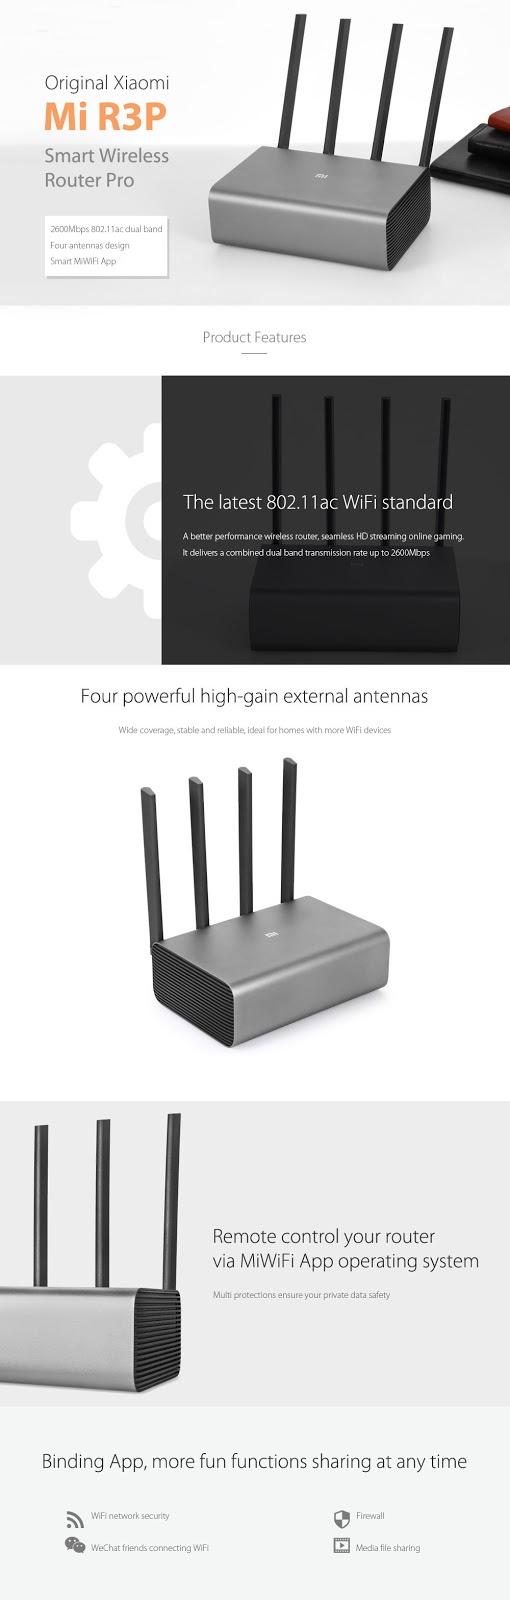 Xiaomi Mi R3P Router 2600 Mbps | World of Xiaomi